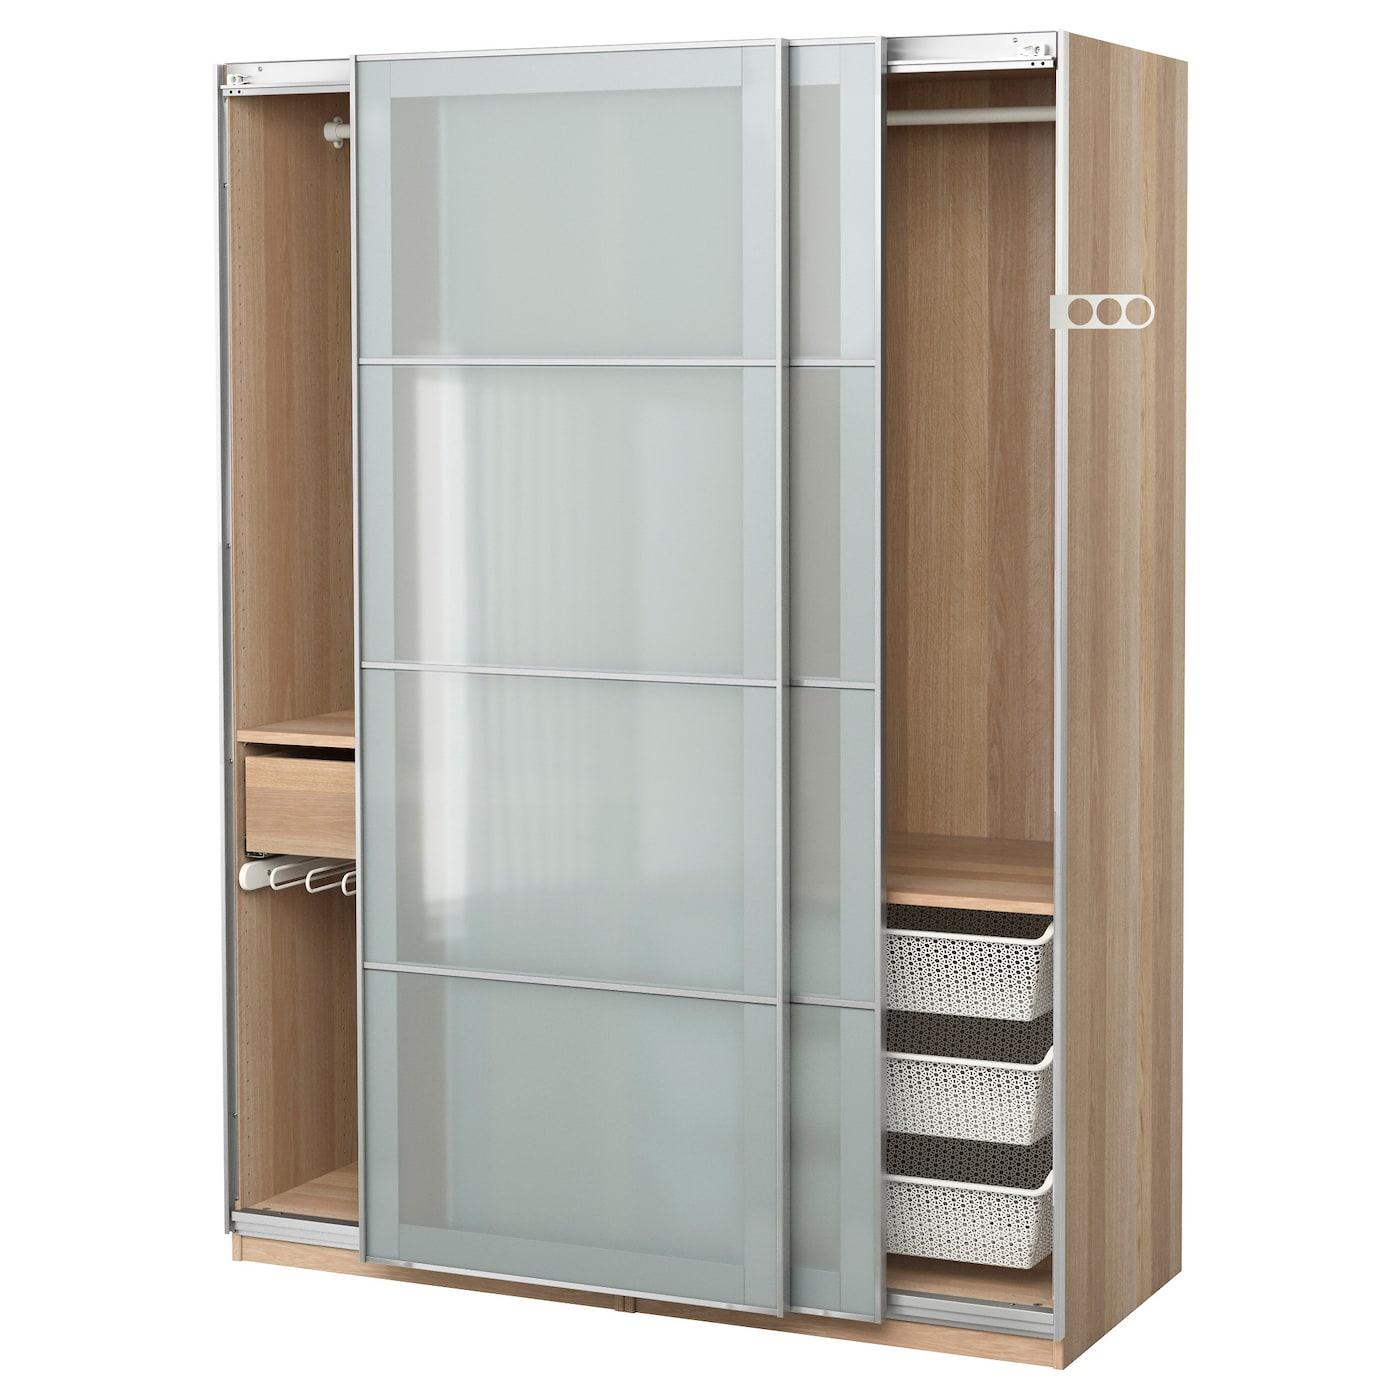 pax kledingkast wit gelazuurd eikeneffect sekken frosted glas 150 x 66 x 201 cm ikea. Black Bedroom Furniture Sets. Home Design Ideas